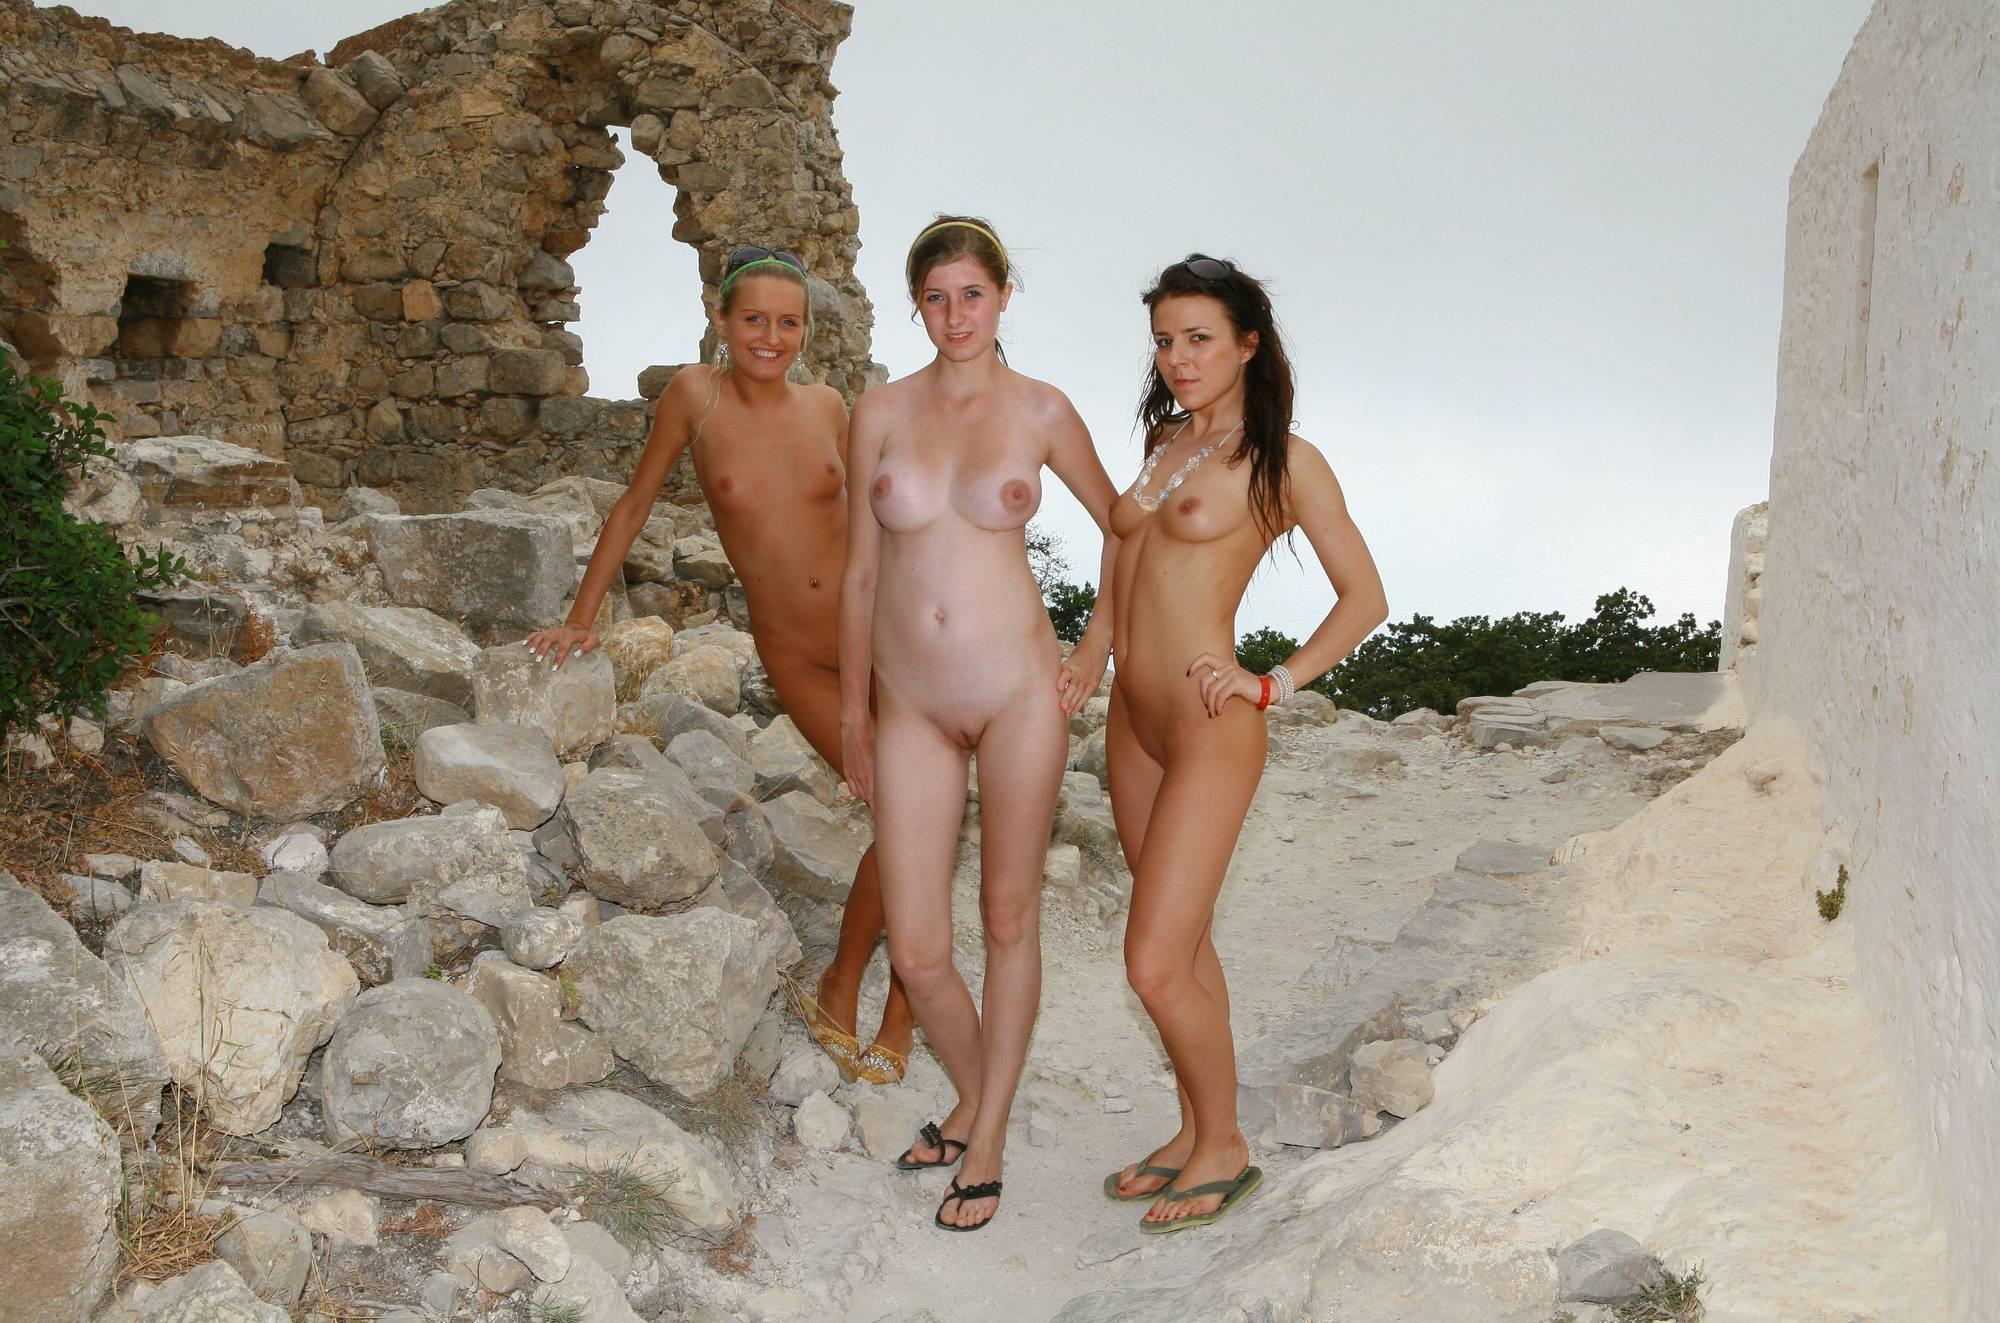 Purenudism Images Greek Old Stone Ruins - 1